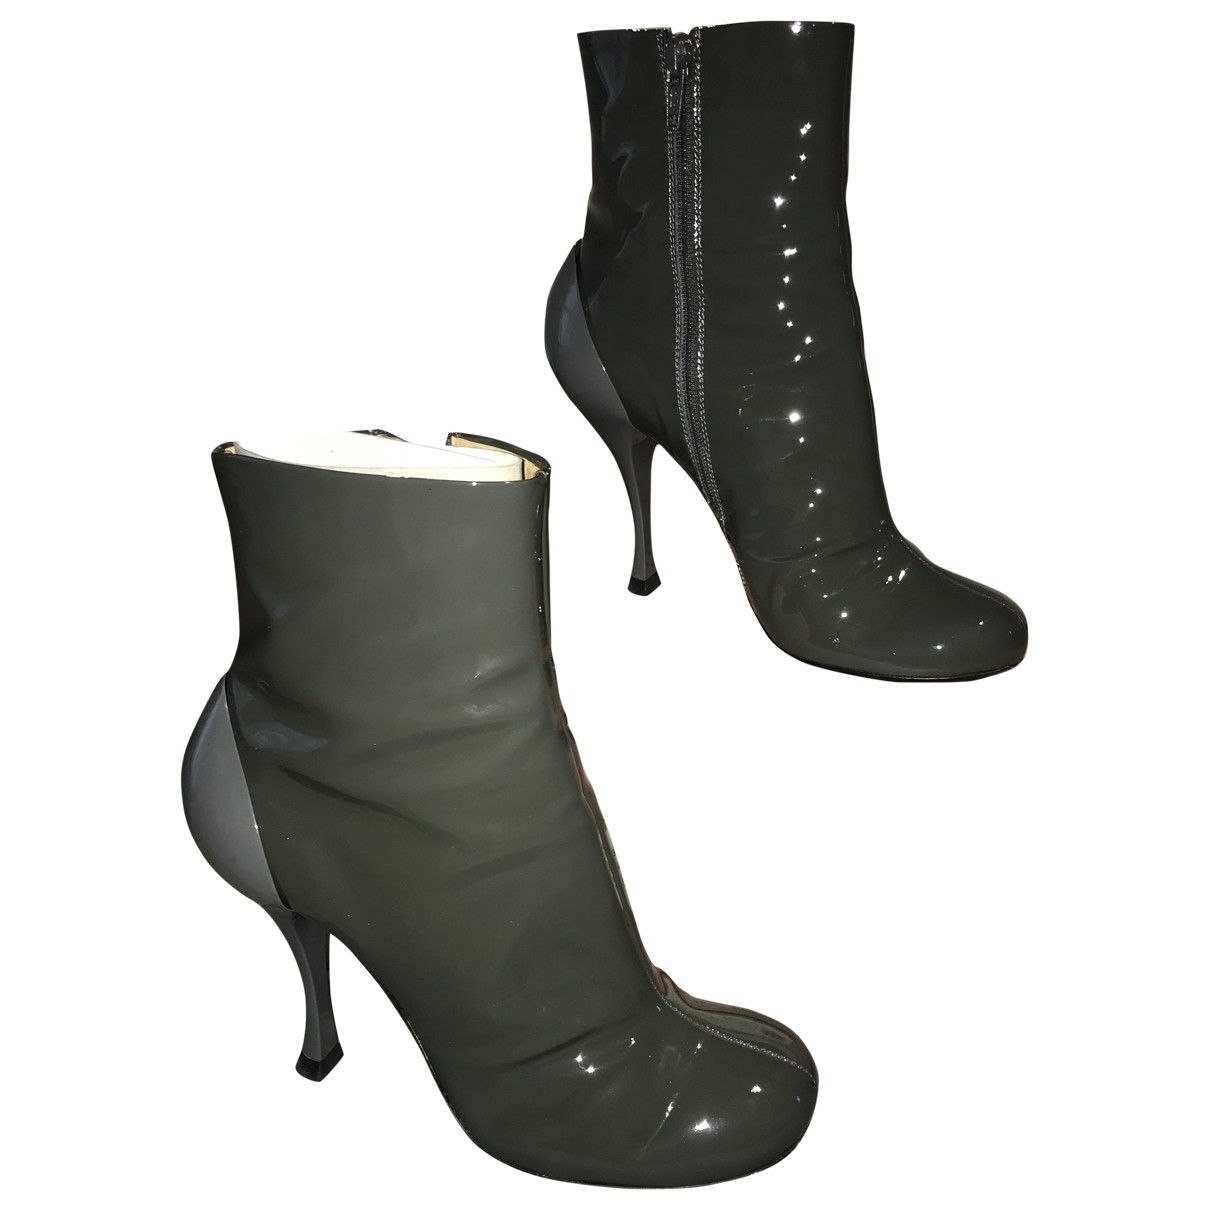 Miu Miu - Boots   pour femme en cuir verni - gris